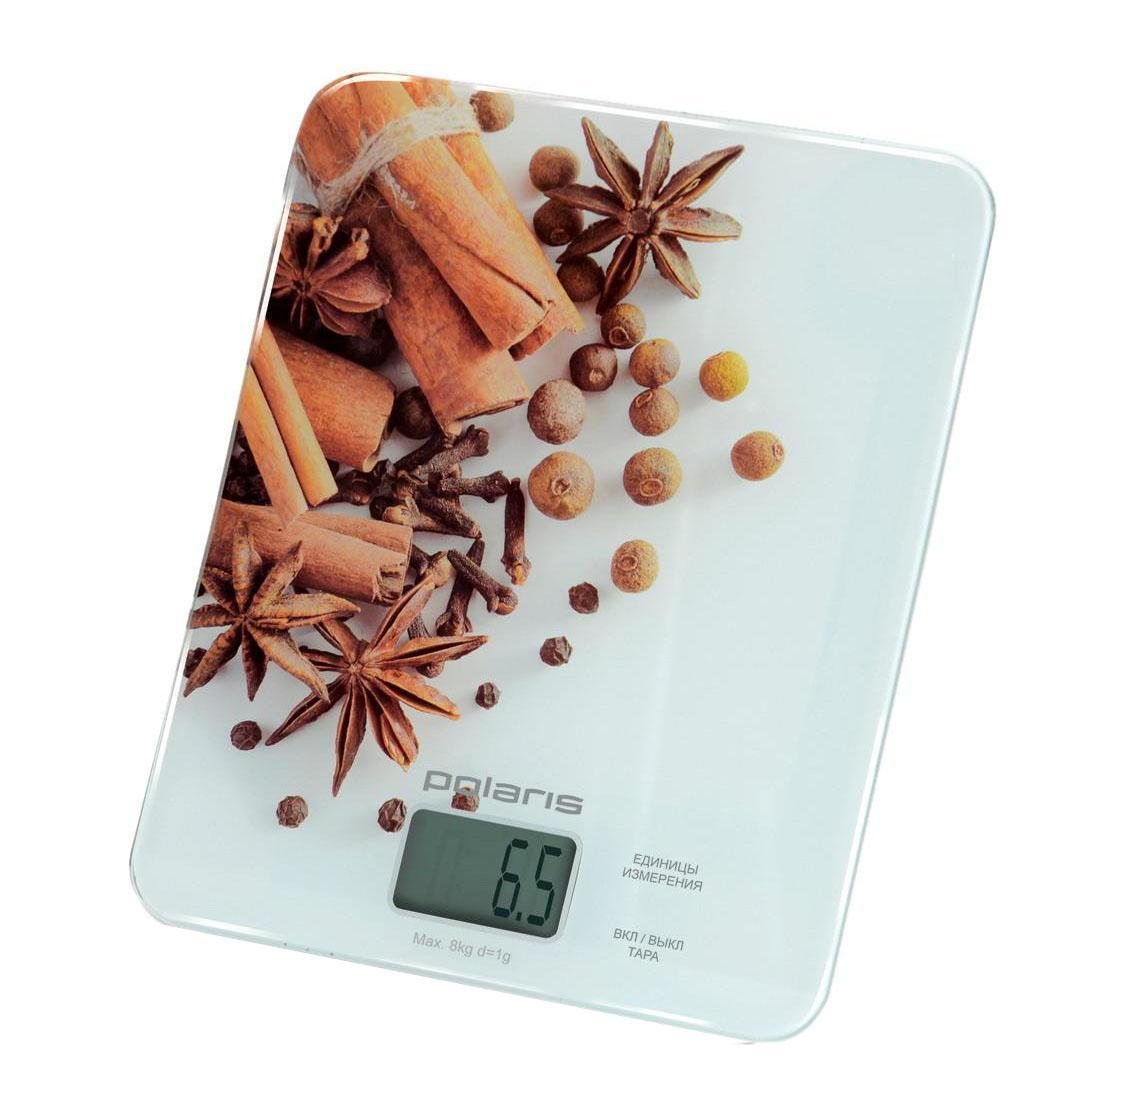 Polaris PKS 0832DG Spices кухонные весыPKS 0832DG Spices